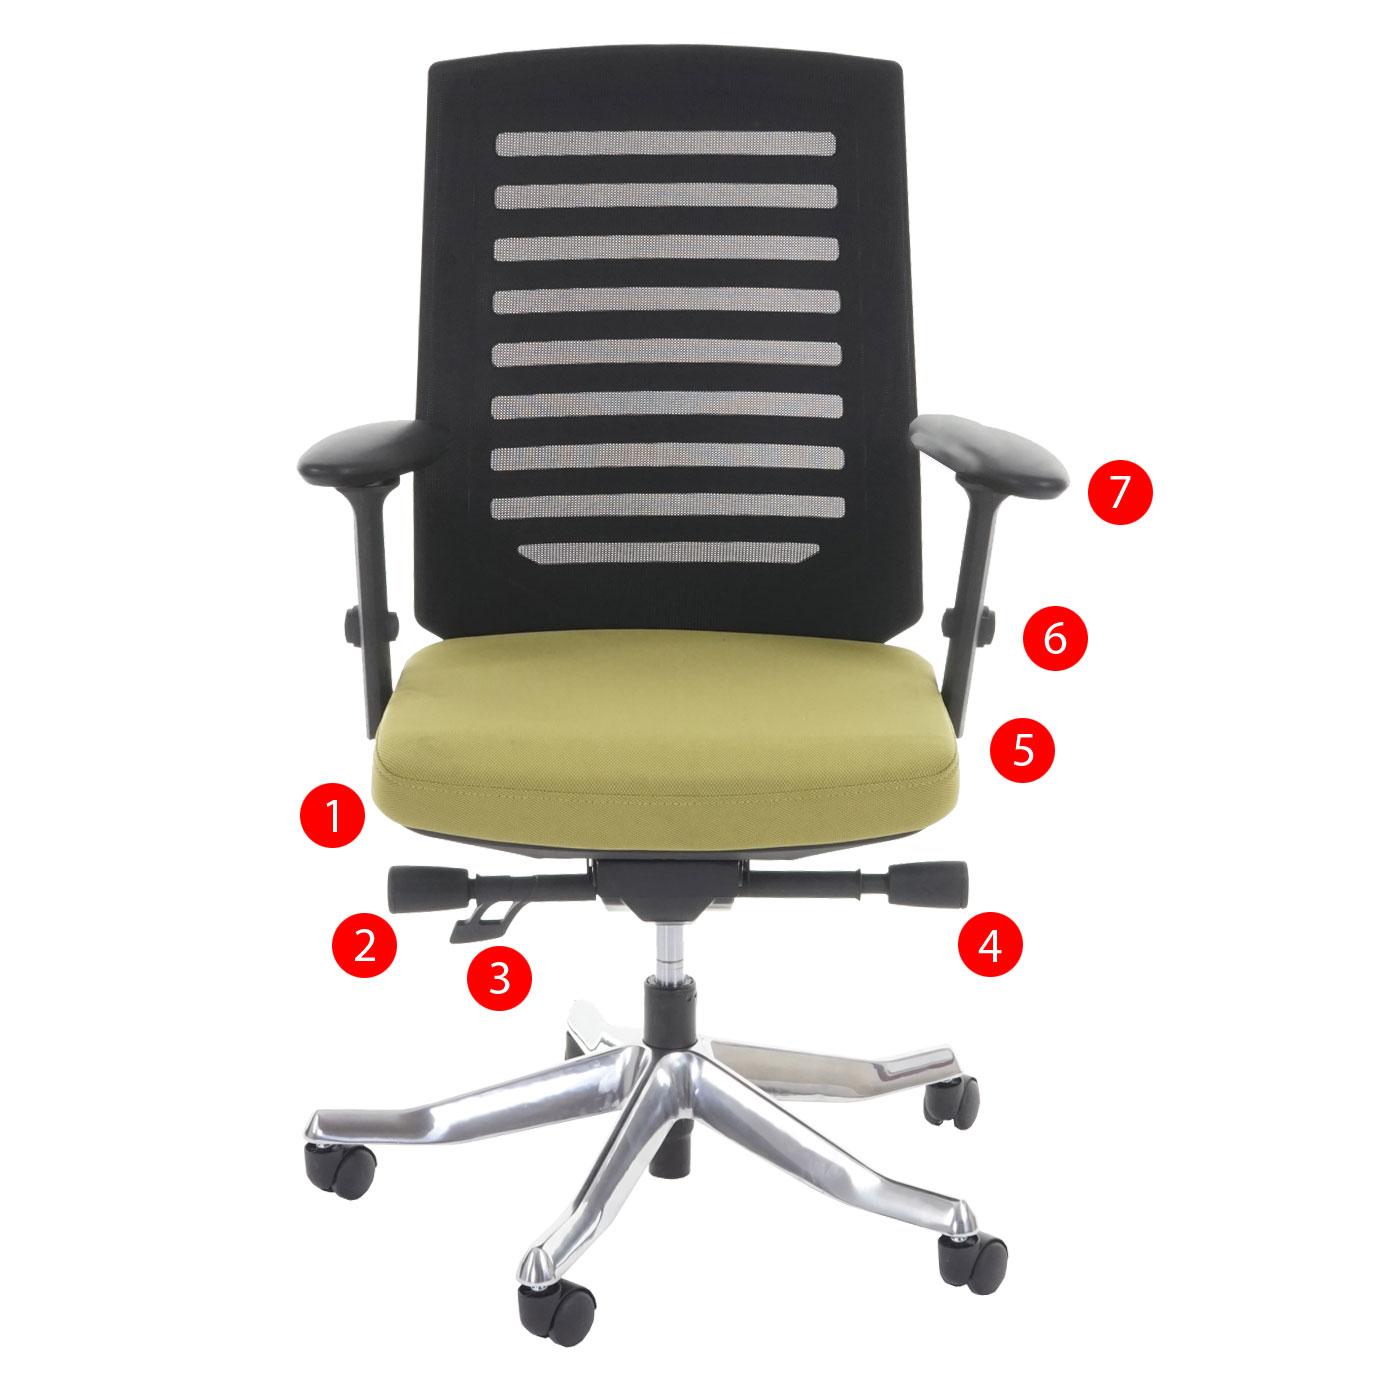 b rostuhl merryfair velo schreibtischstuhl polster netz sliding funktion ergonomisch olive. Black Bedroom Furniture Sets. Home Design Ideas